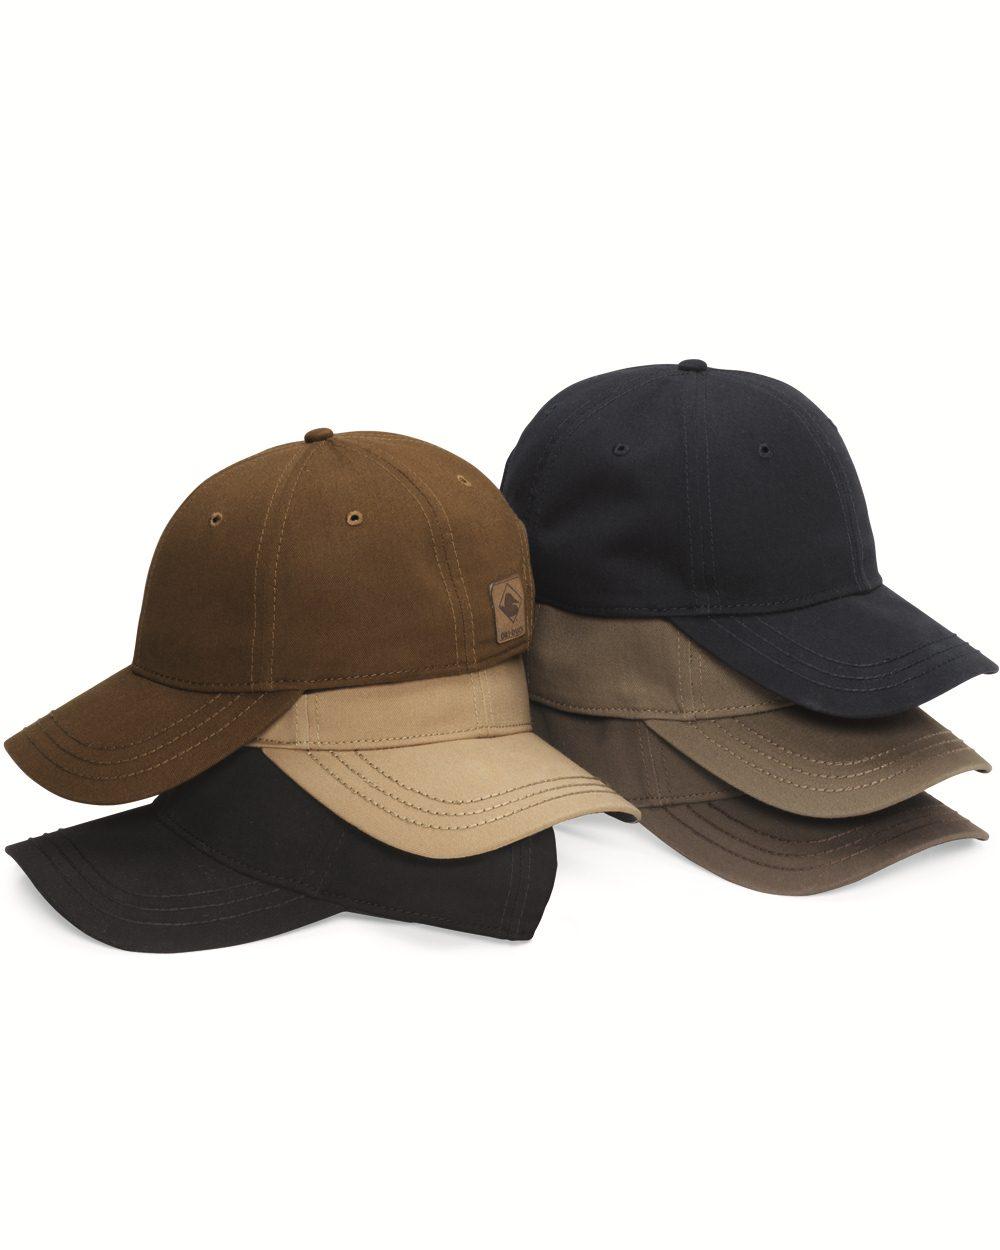 DRI DUCK 3220 - Heritage Brushed Twill Cap